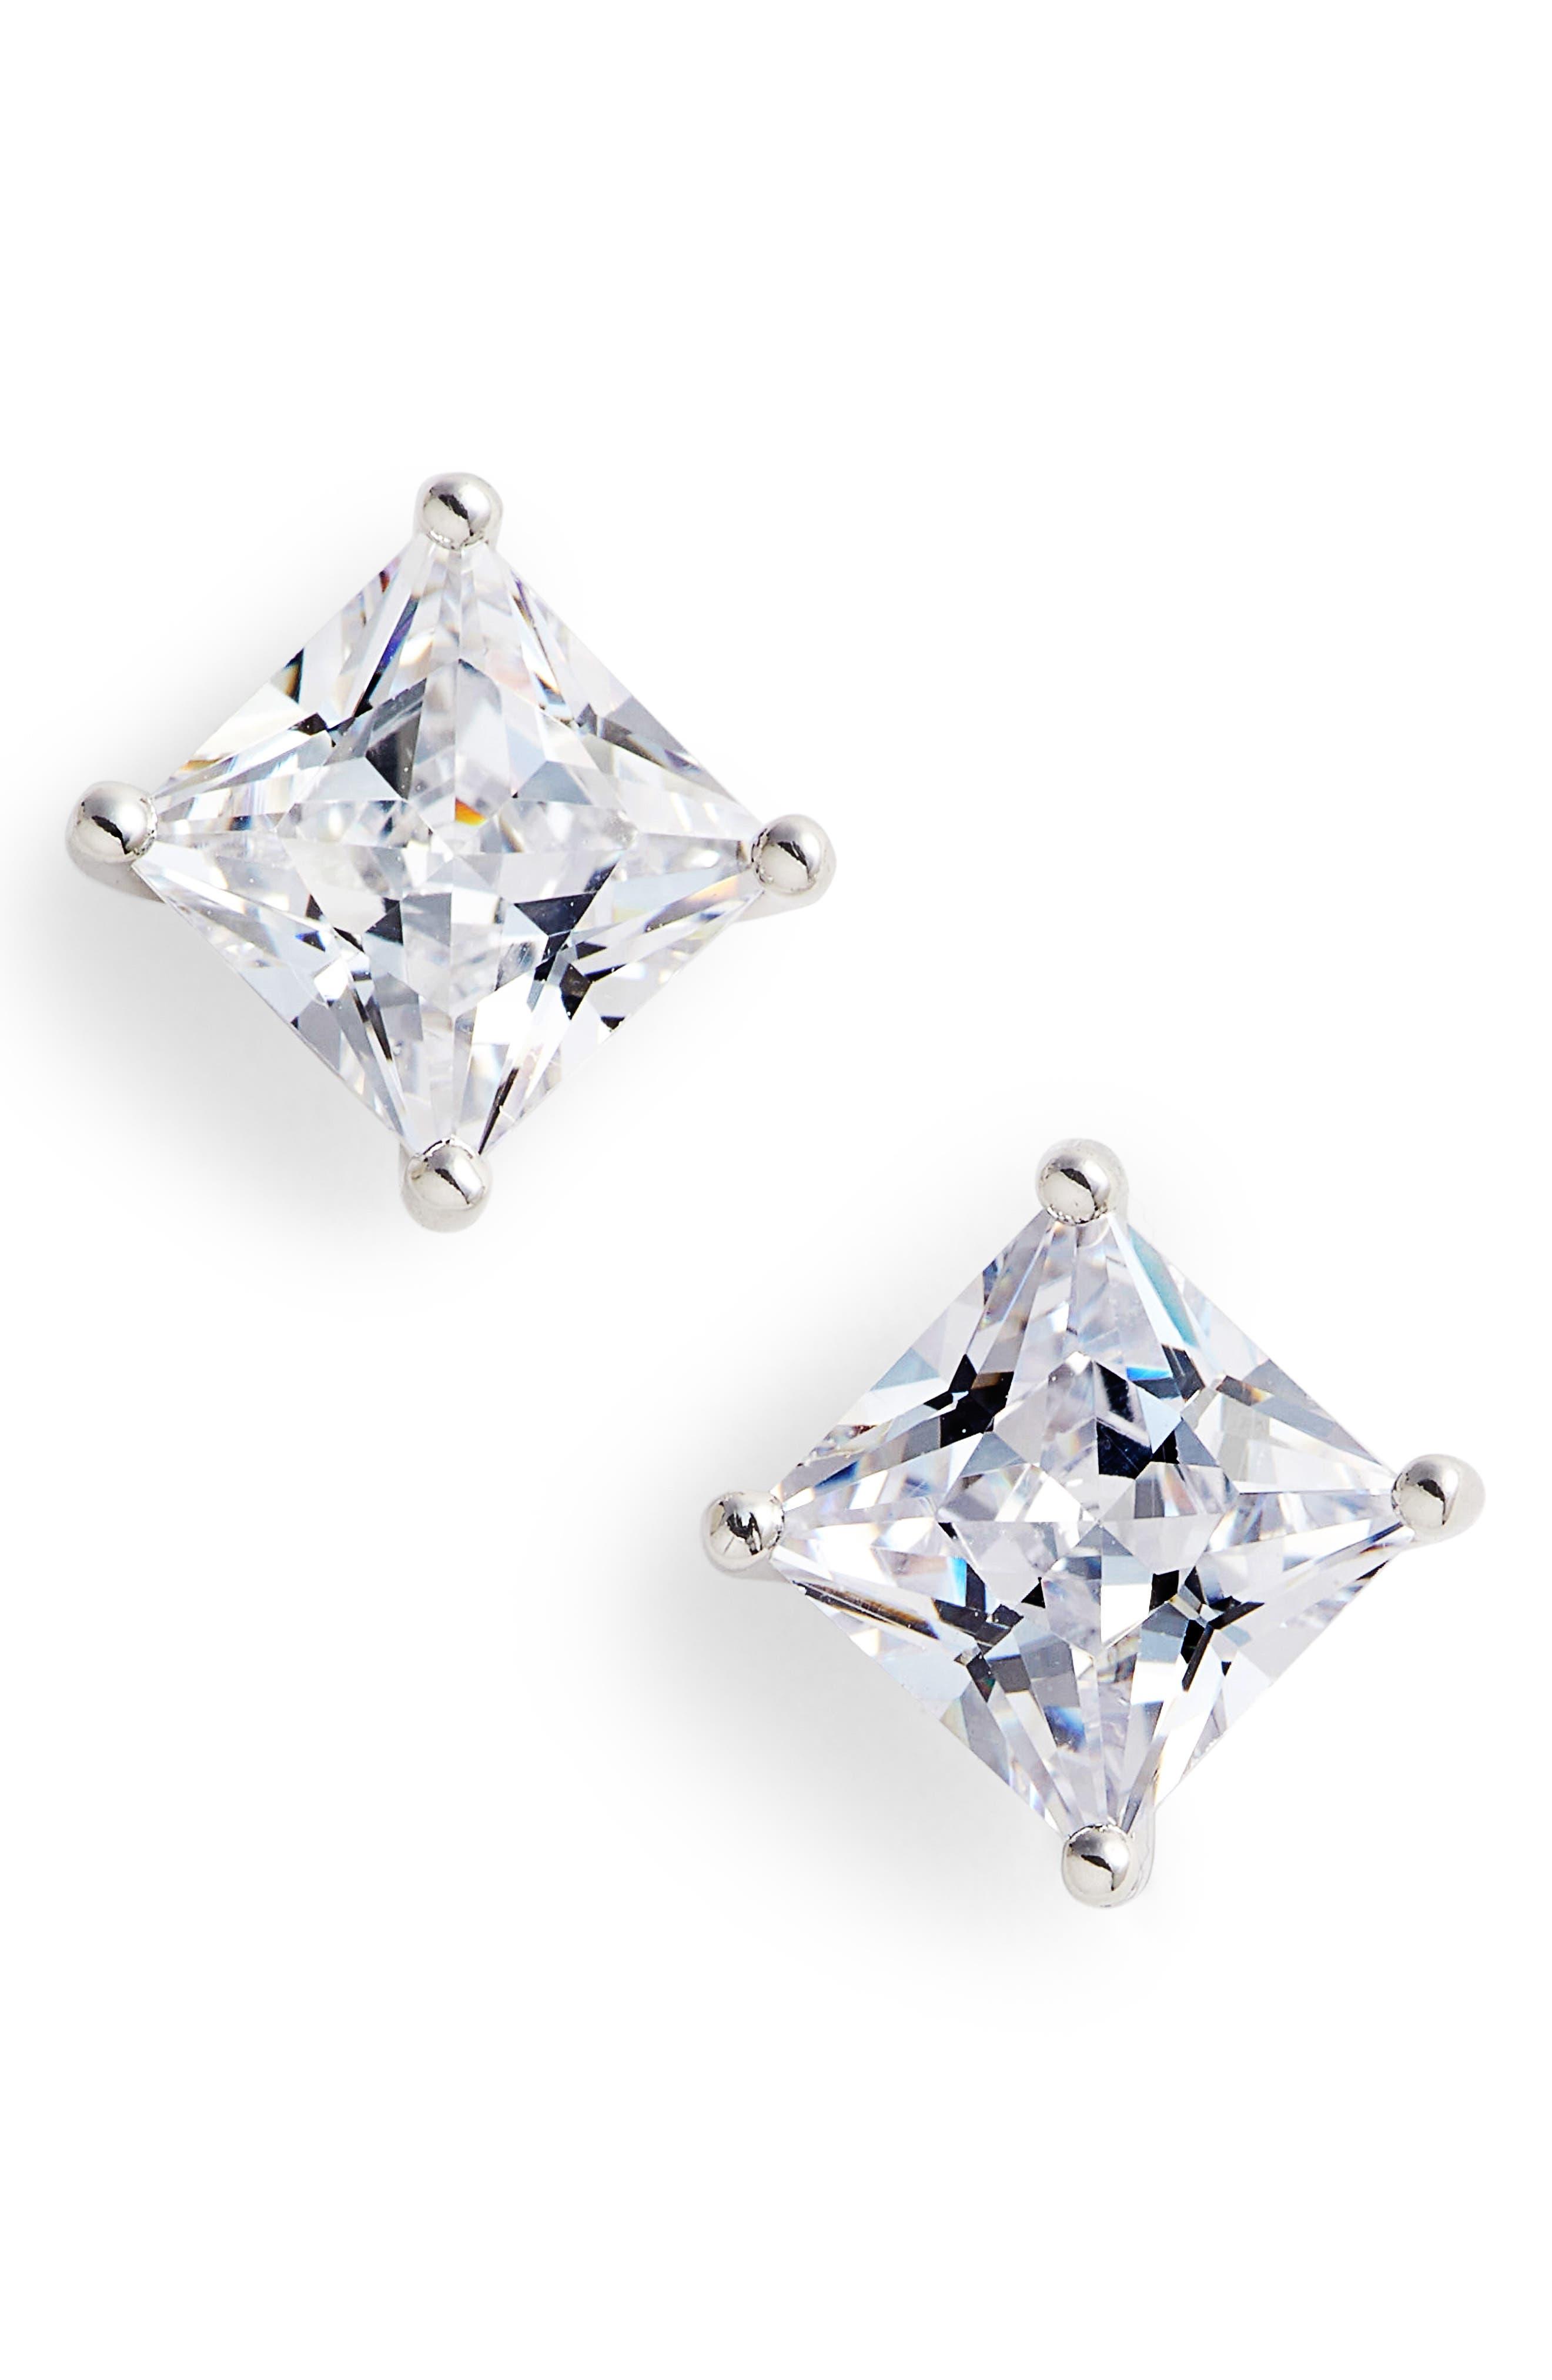 4ct tw Princess Cut Cubic Zirconia Stud Earrings,                             Main thumbnail 1, color,                             Platinum